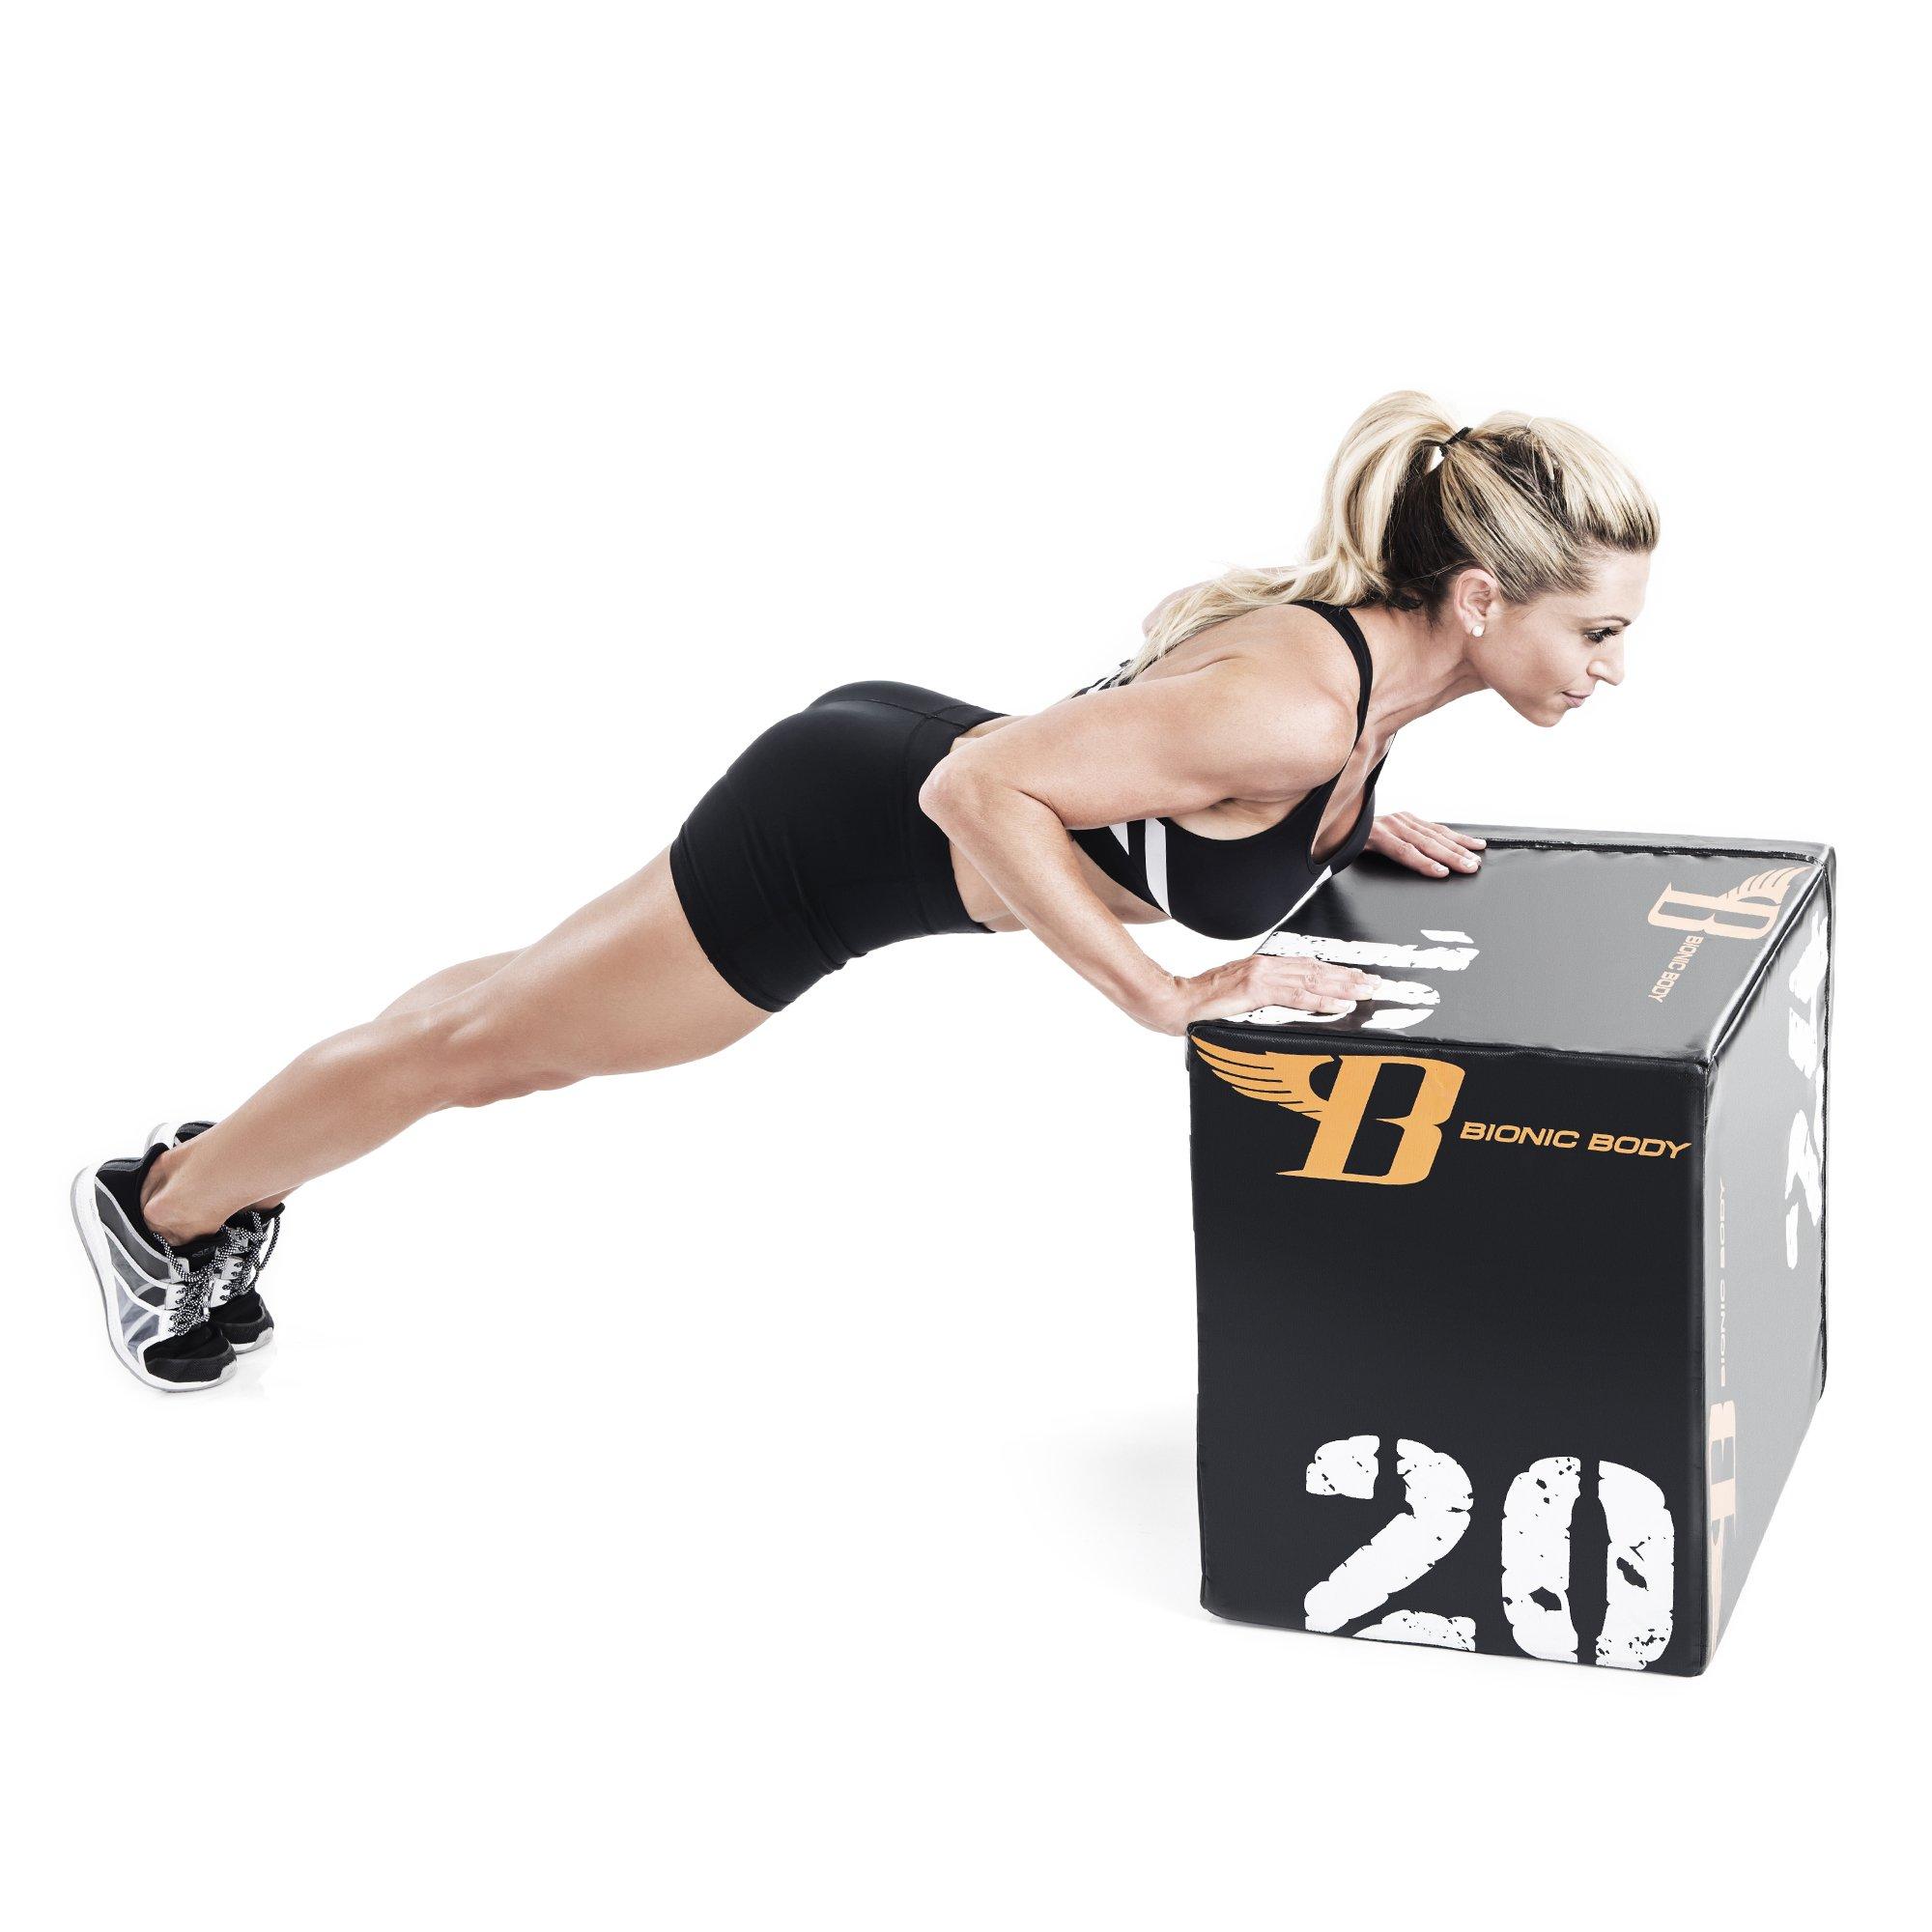 Bionic Body Plyo Exercise Box Plyometric Box with Soft Cover BBPB-1106 by Bionic Body (Image #3)